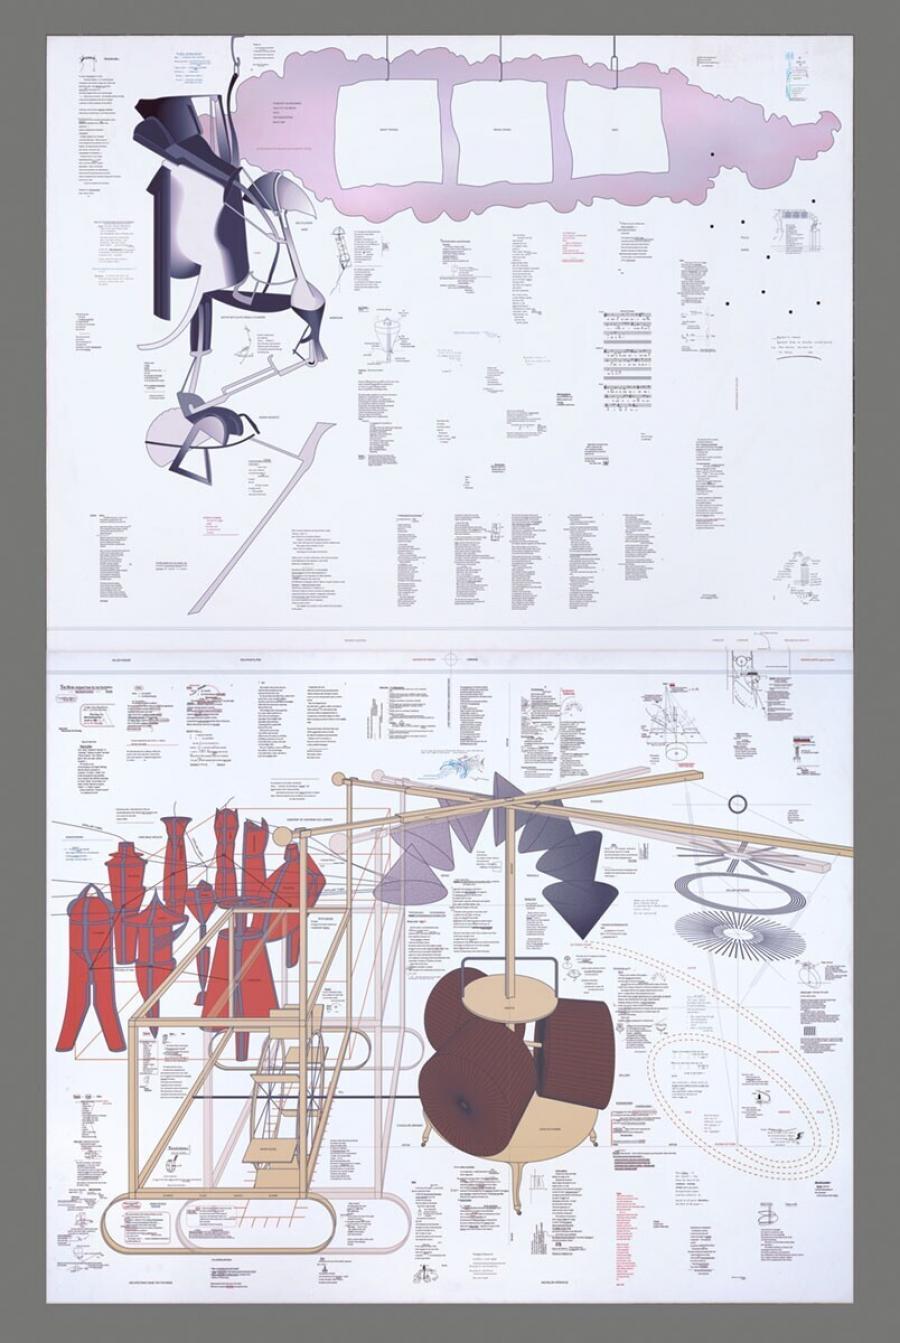 Typo/Topography of Marcel Duchamp's Large Glass (Typo/Topografie van Marcel Duchamp's Grote Glas)